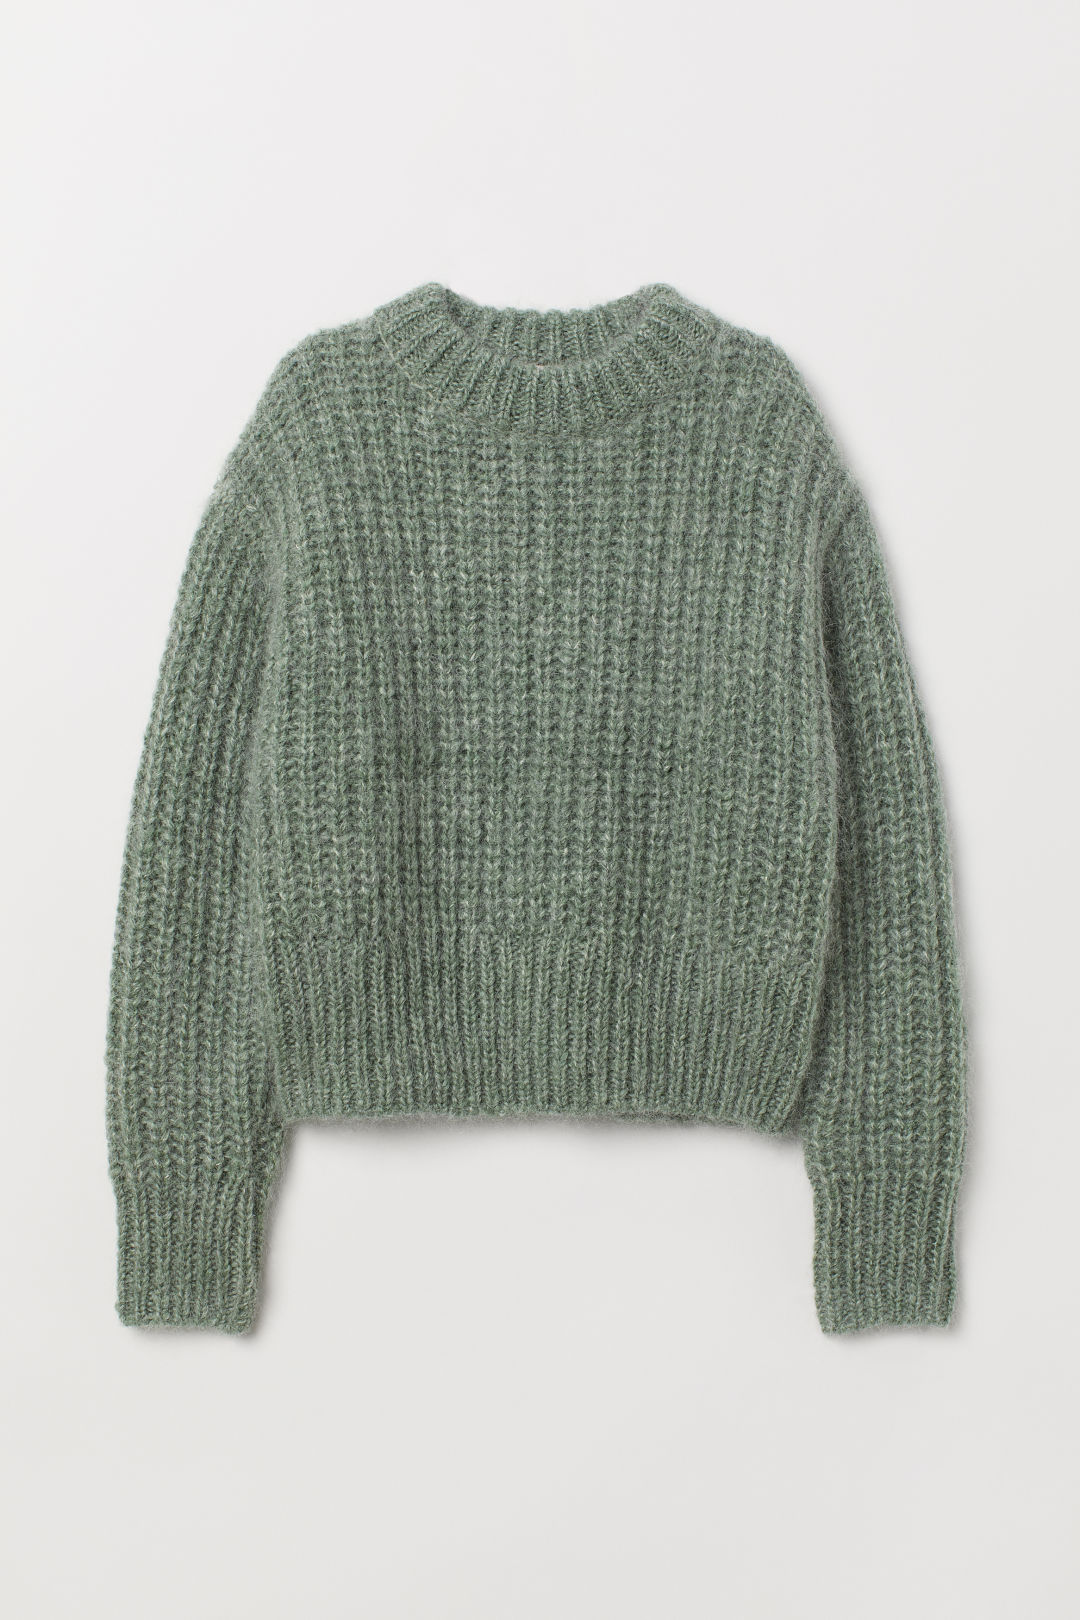 HM-woollensweater2